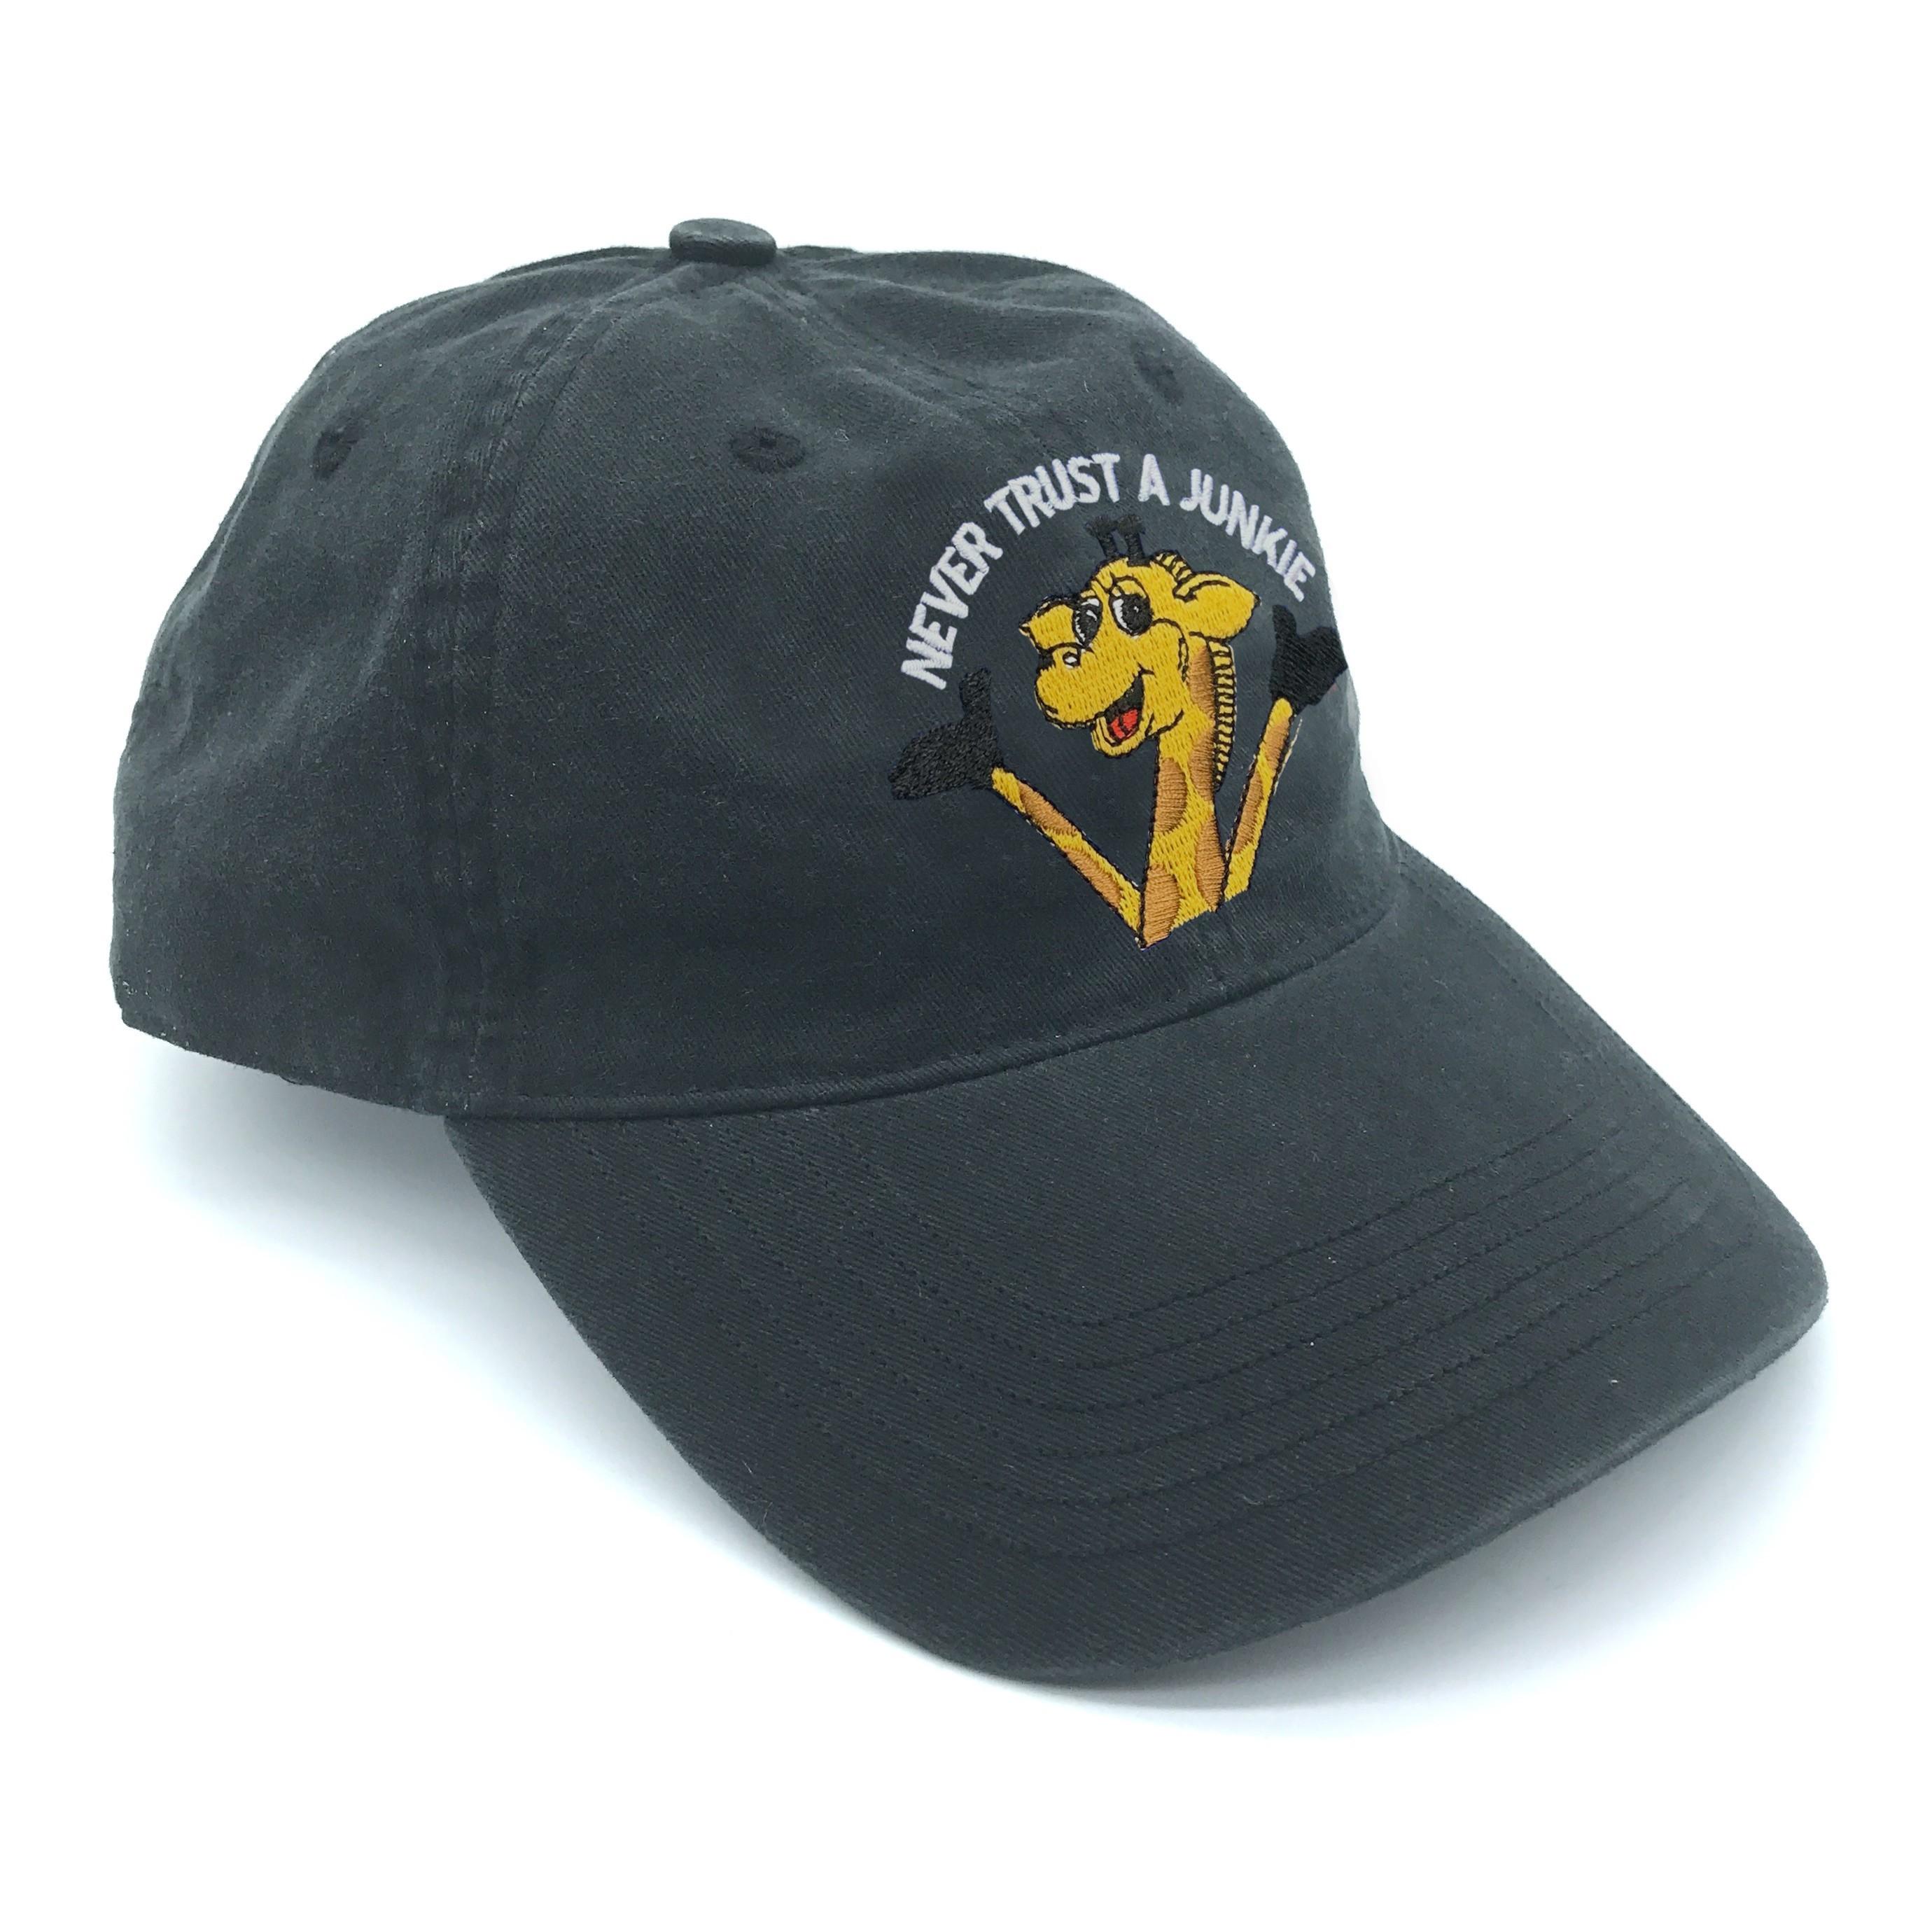 Junkie Faded Black Dad Hat  6e11fe58d9e6